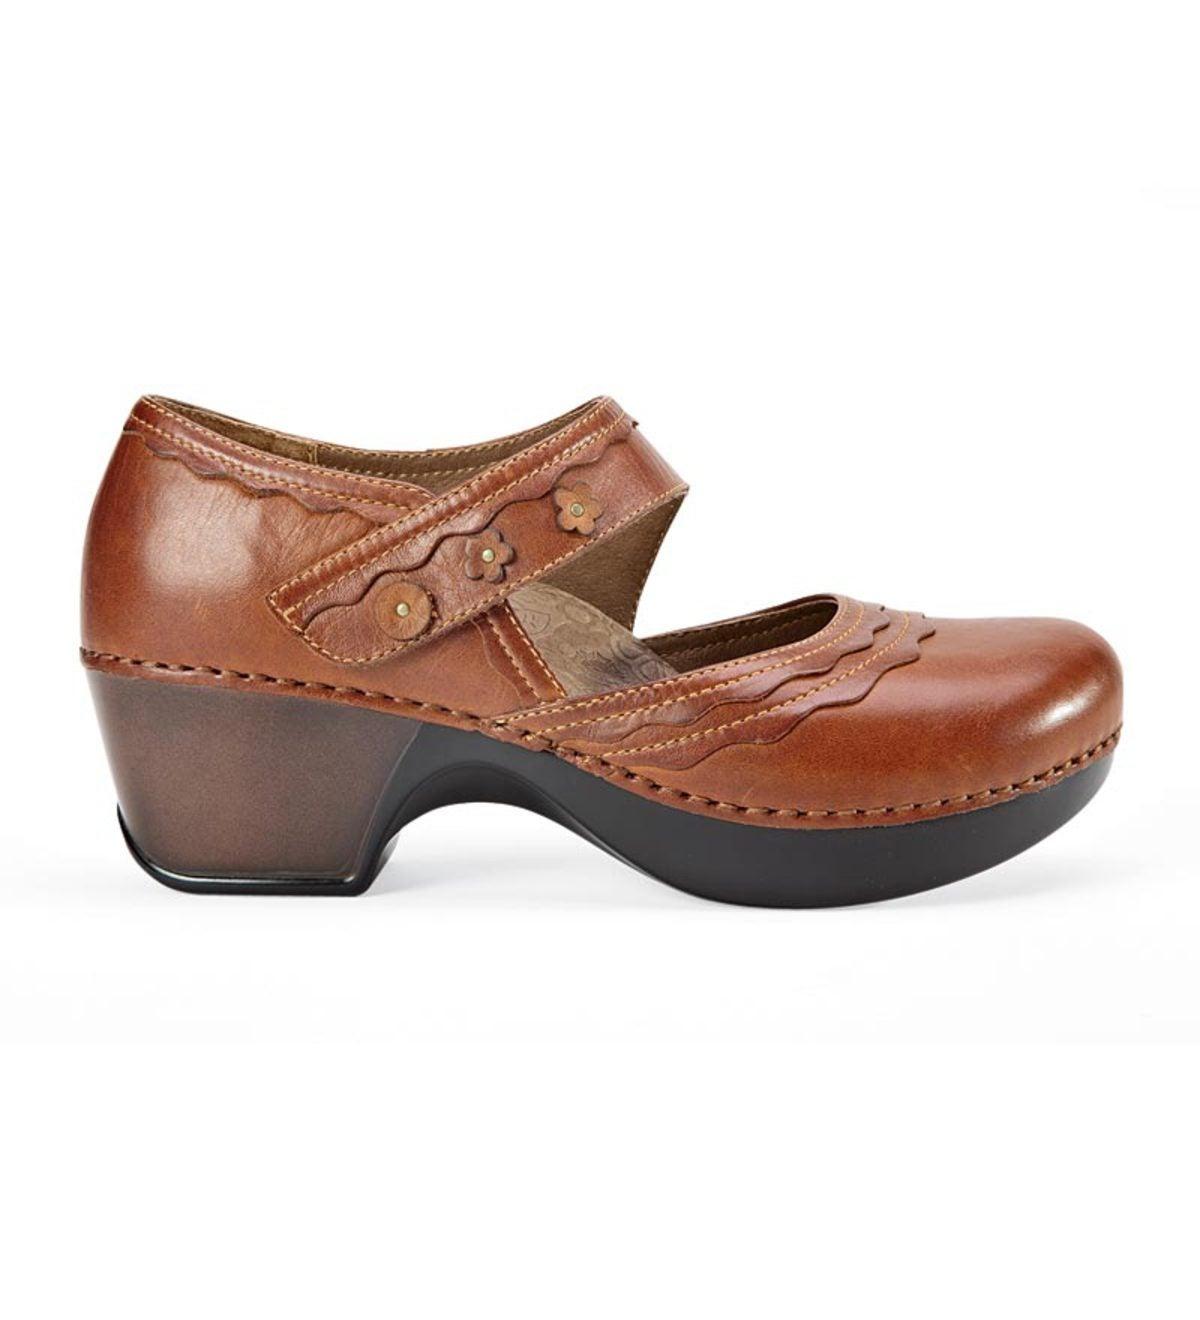 30919809e817 Dansko Harlow Mary Jane Shoe for Women